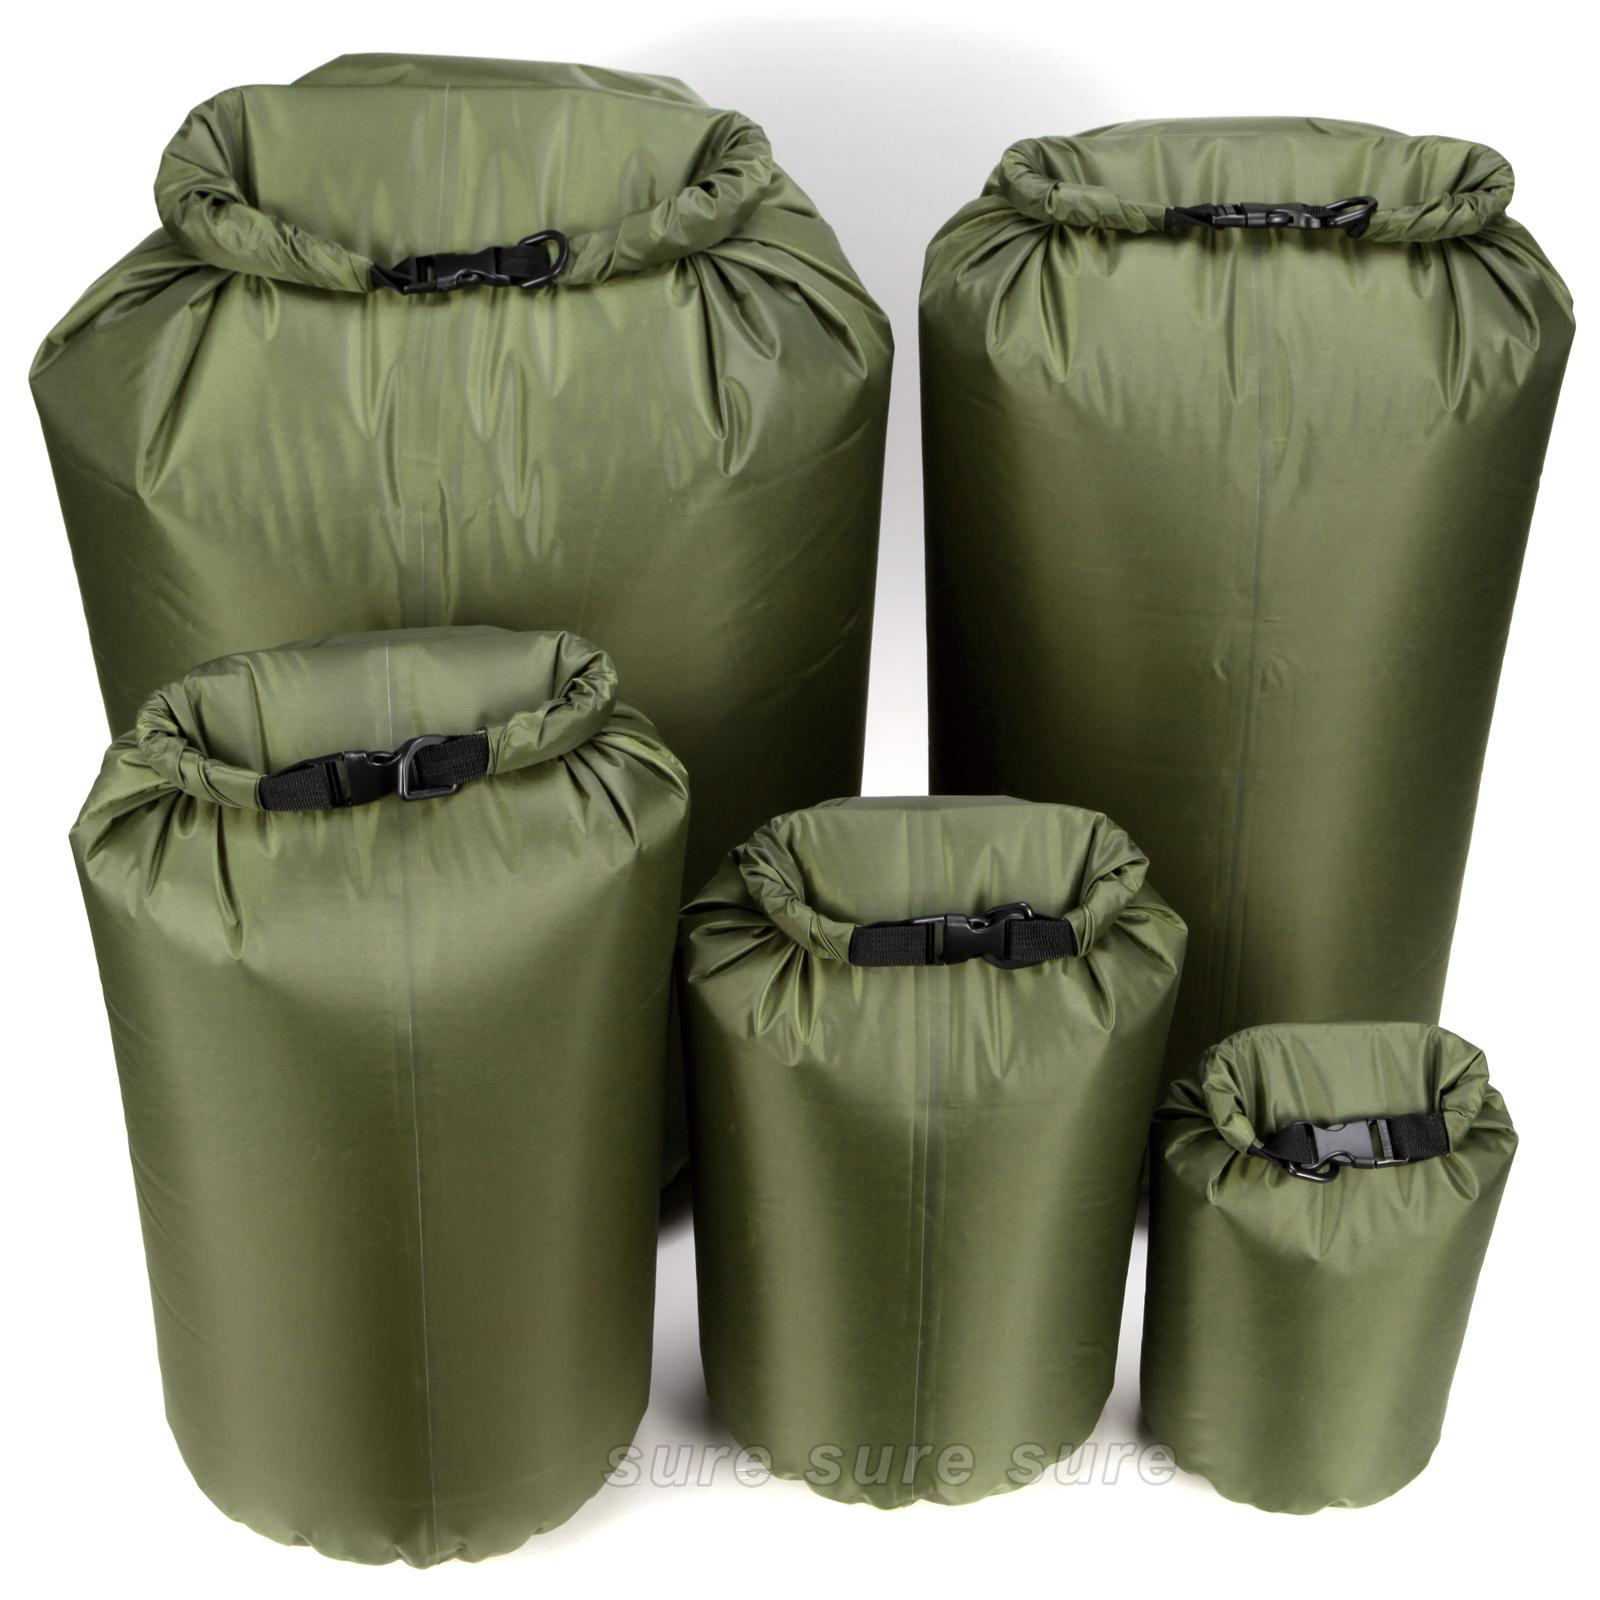 Wasserdicht Transportsack Camping Packsack Wasserdicht